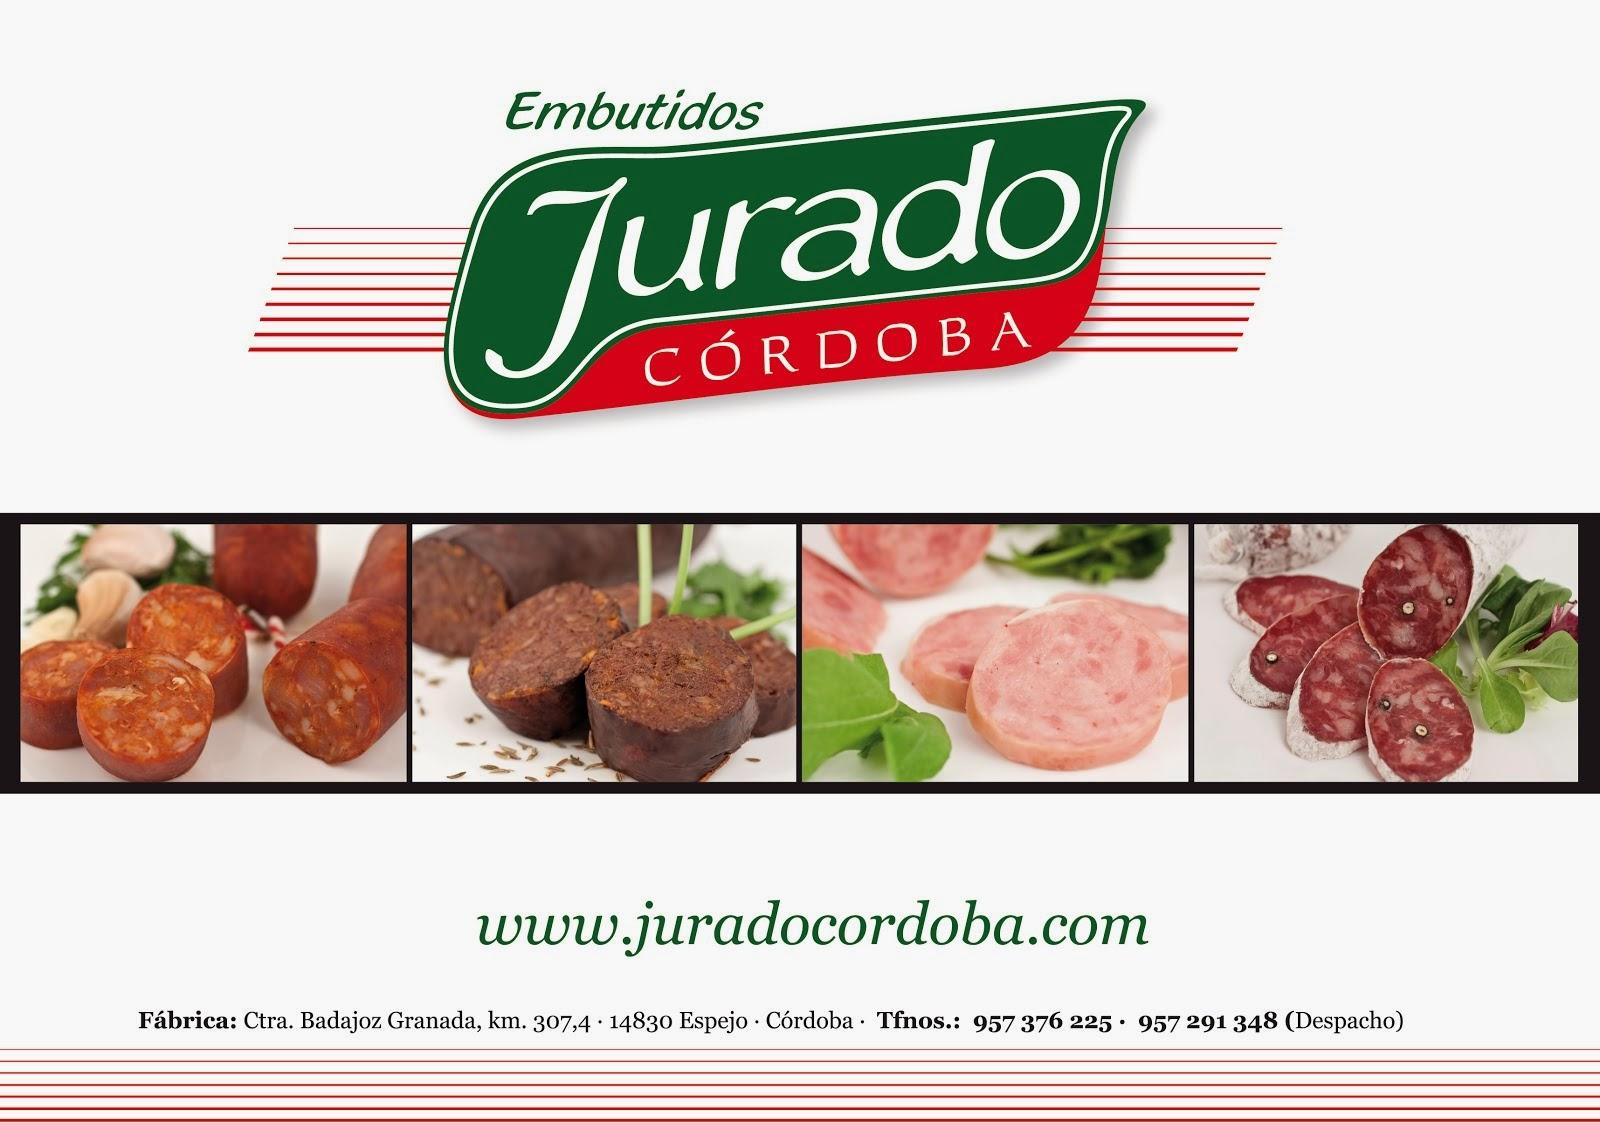 EMBUTIDOS JURADO